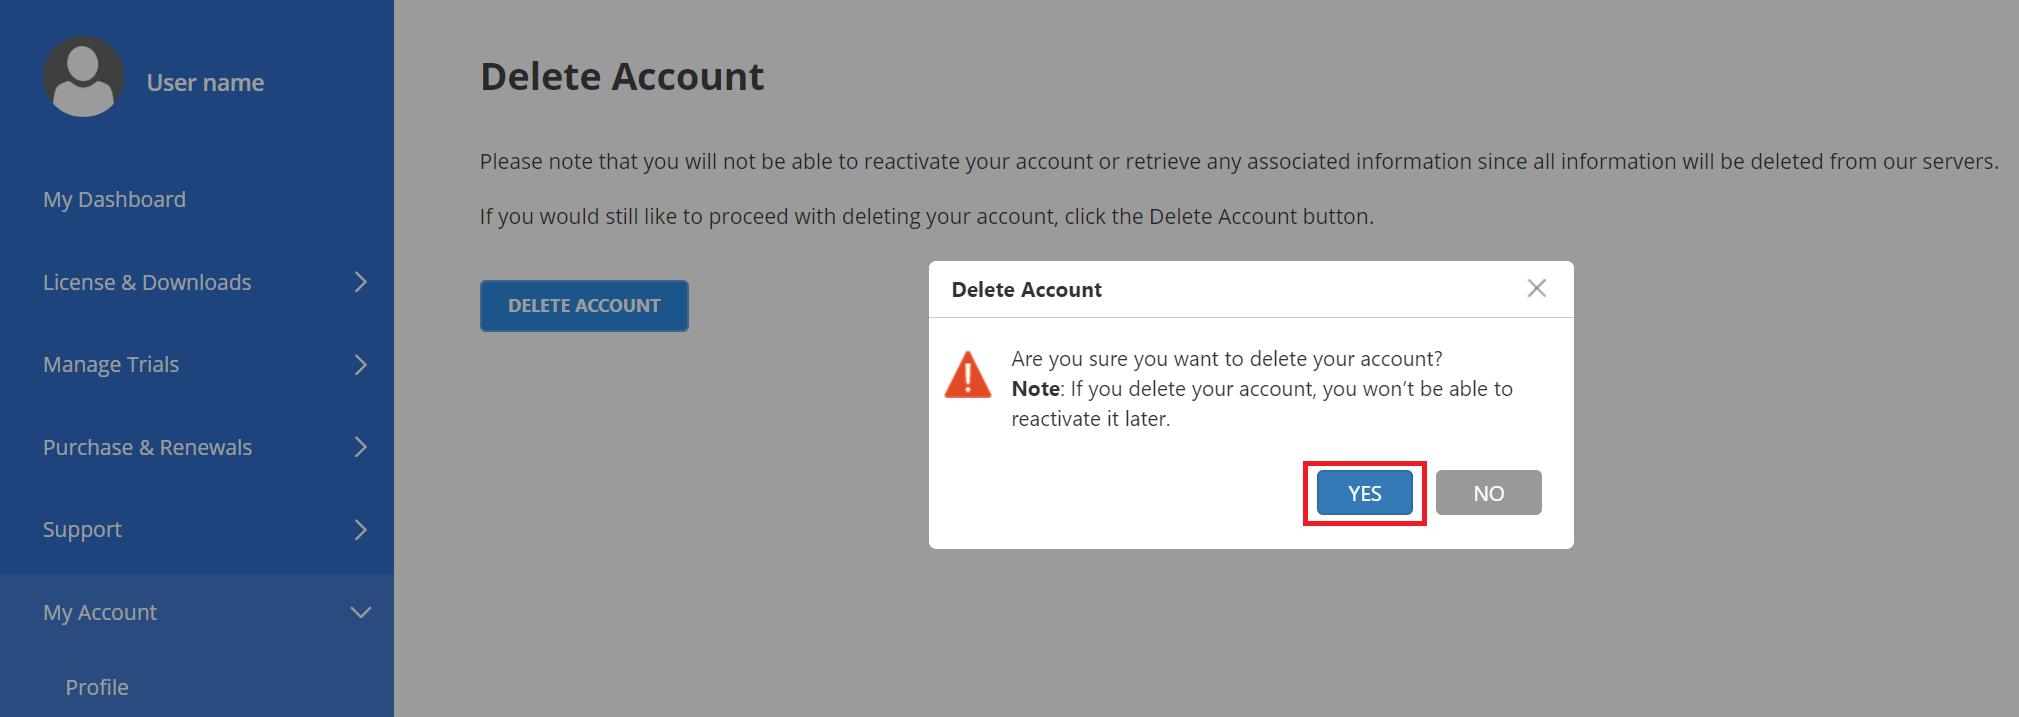 Delete account request confirmation pop-up